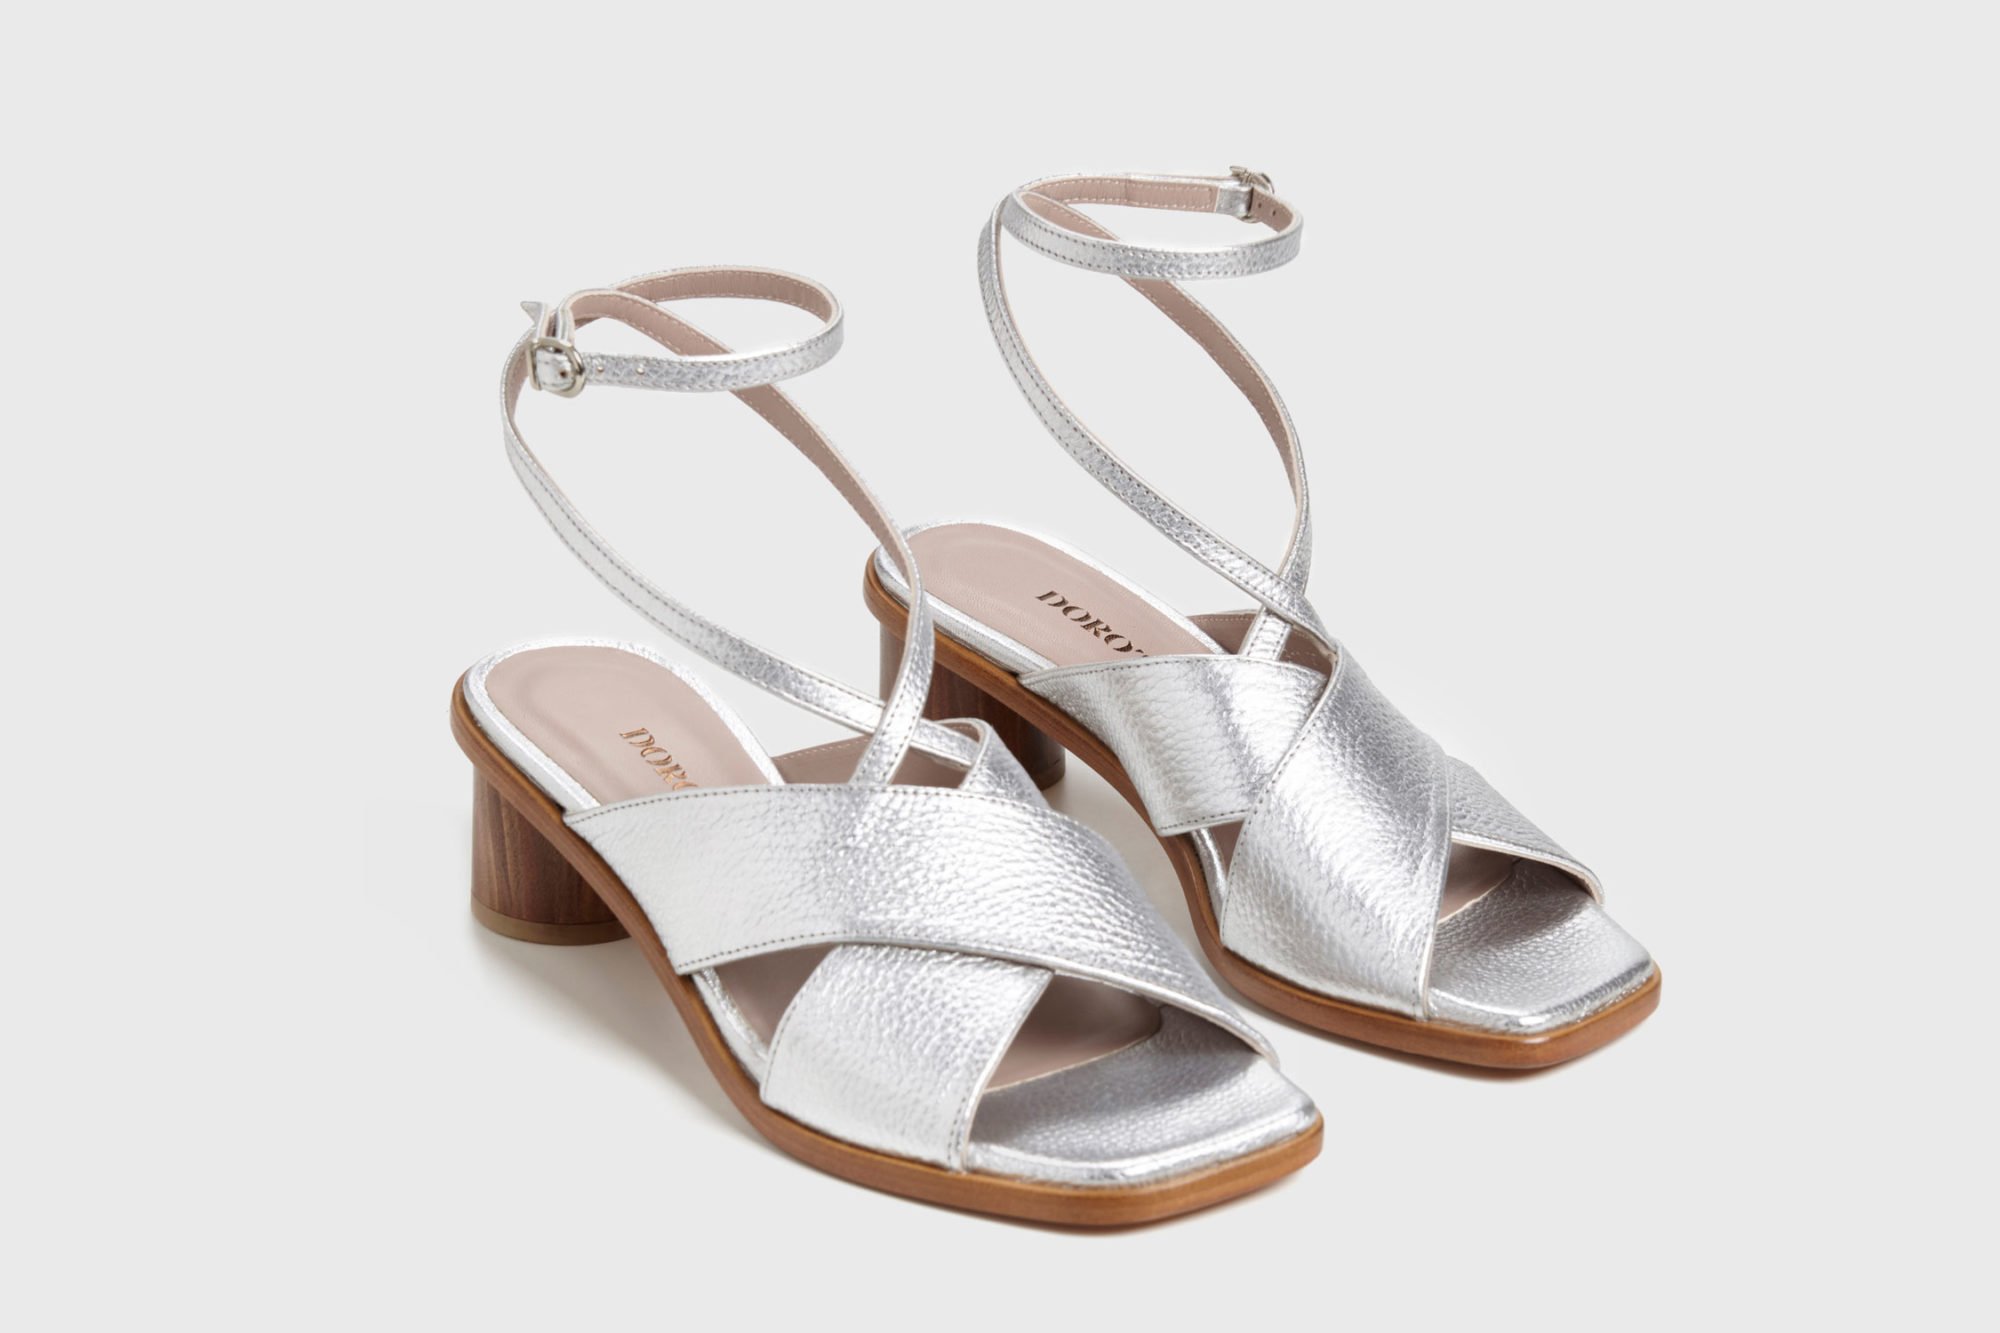 Sandalia de tacón medio Daphne ss17 par